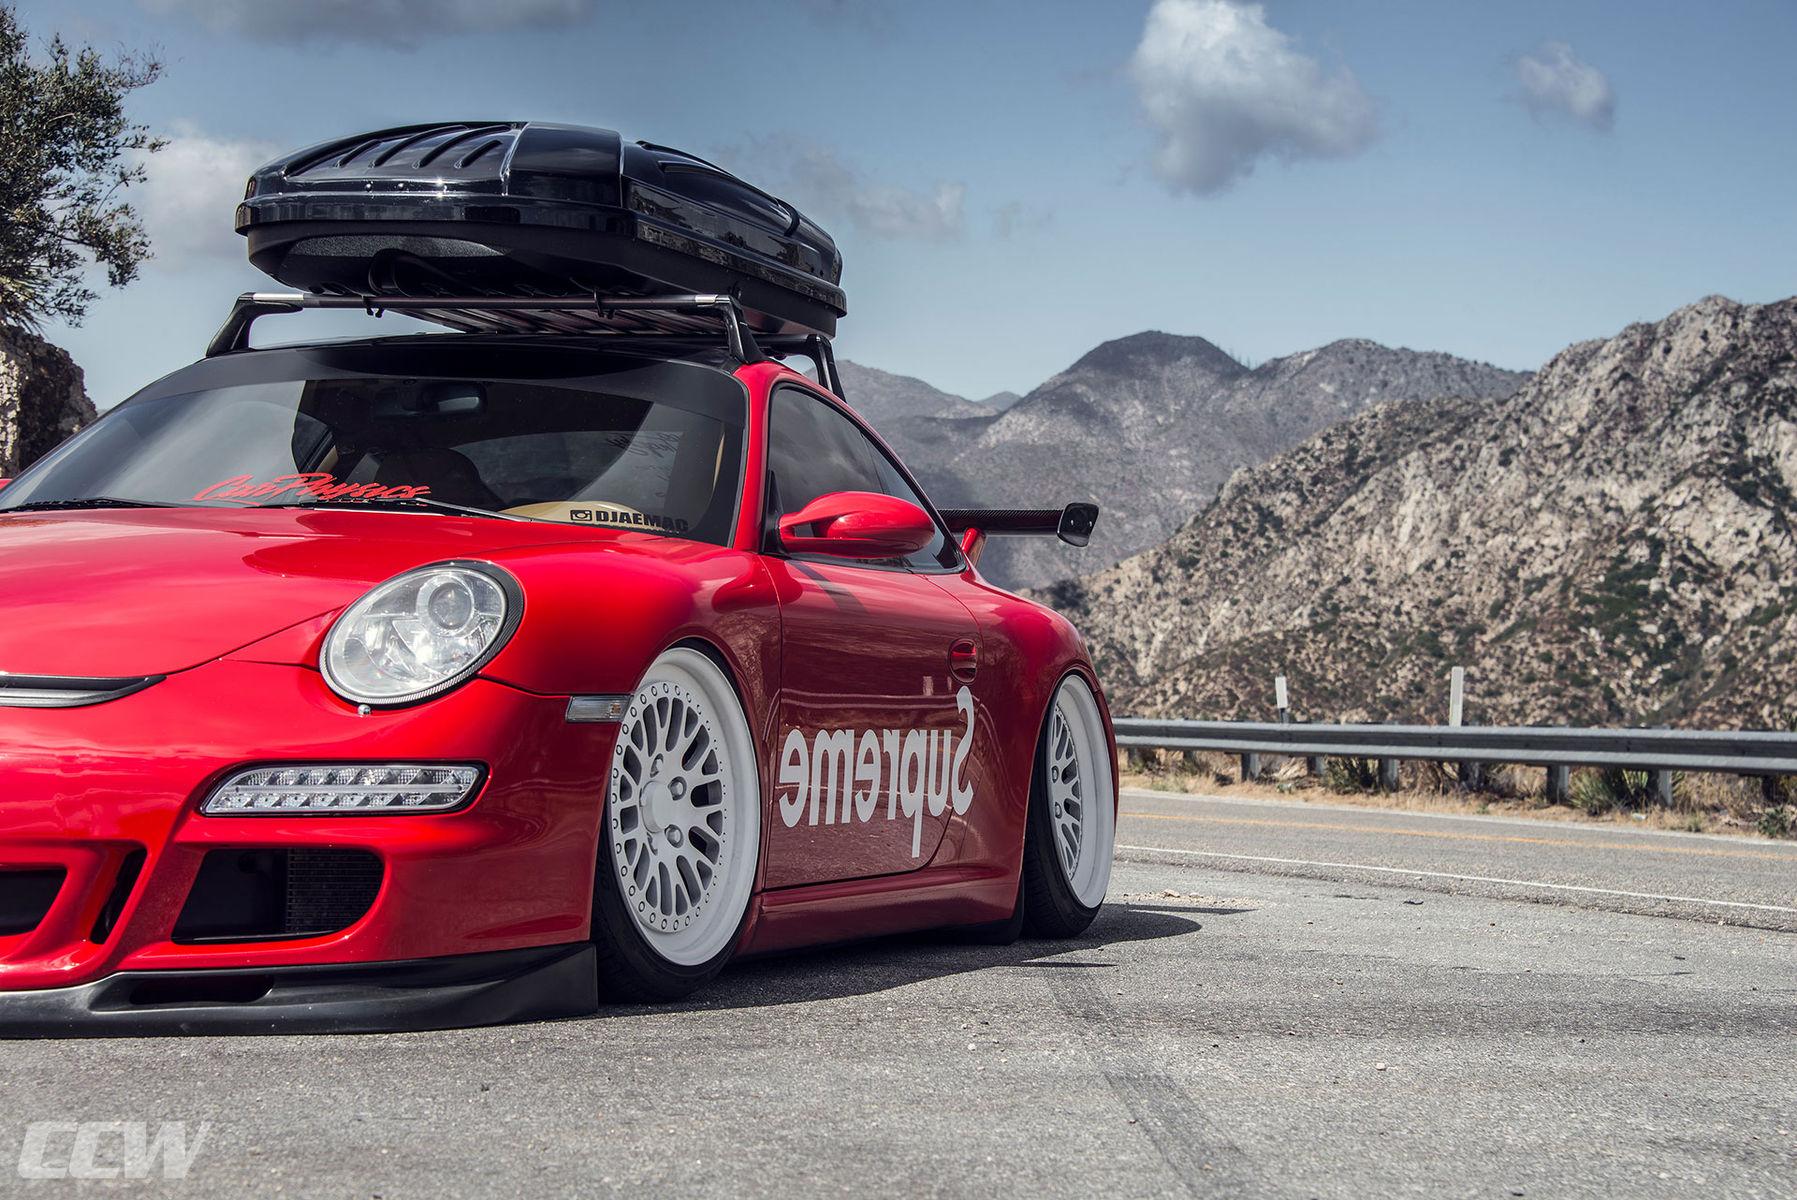 2013 Porsche 911 | Supreme Red Bagged Porsche 997 911 Carrera - CCW Classic 3 Piece Wheels